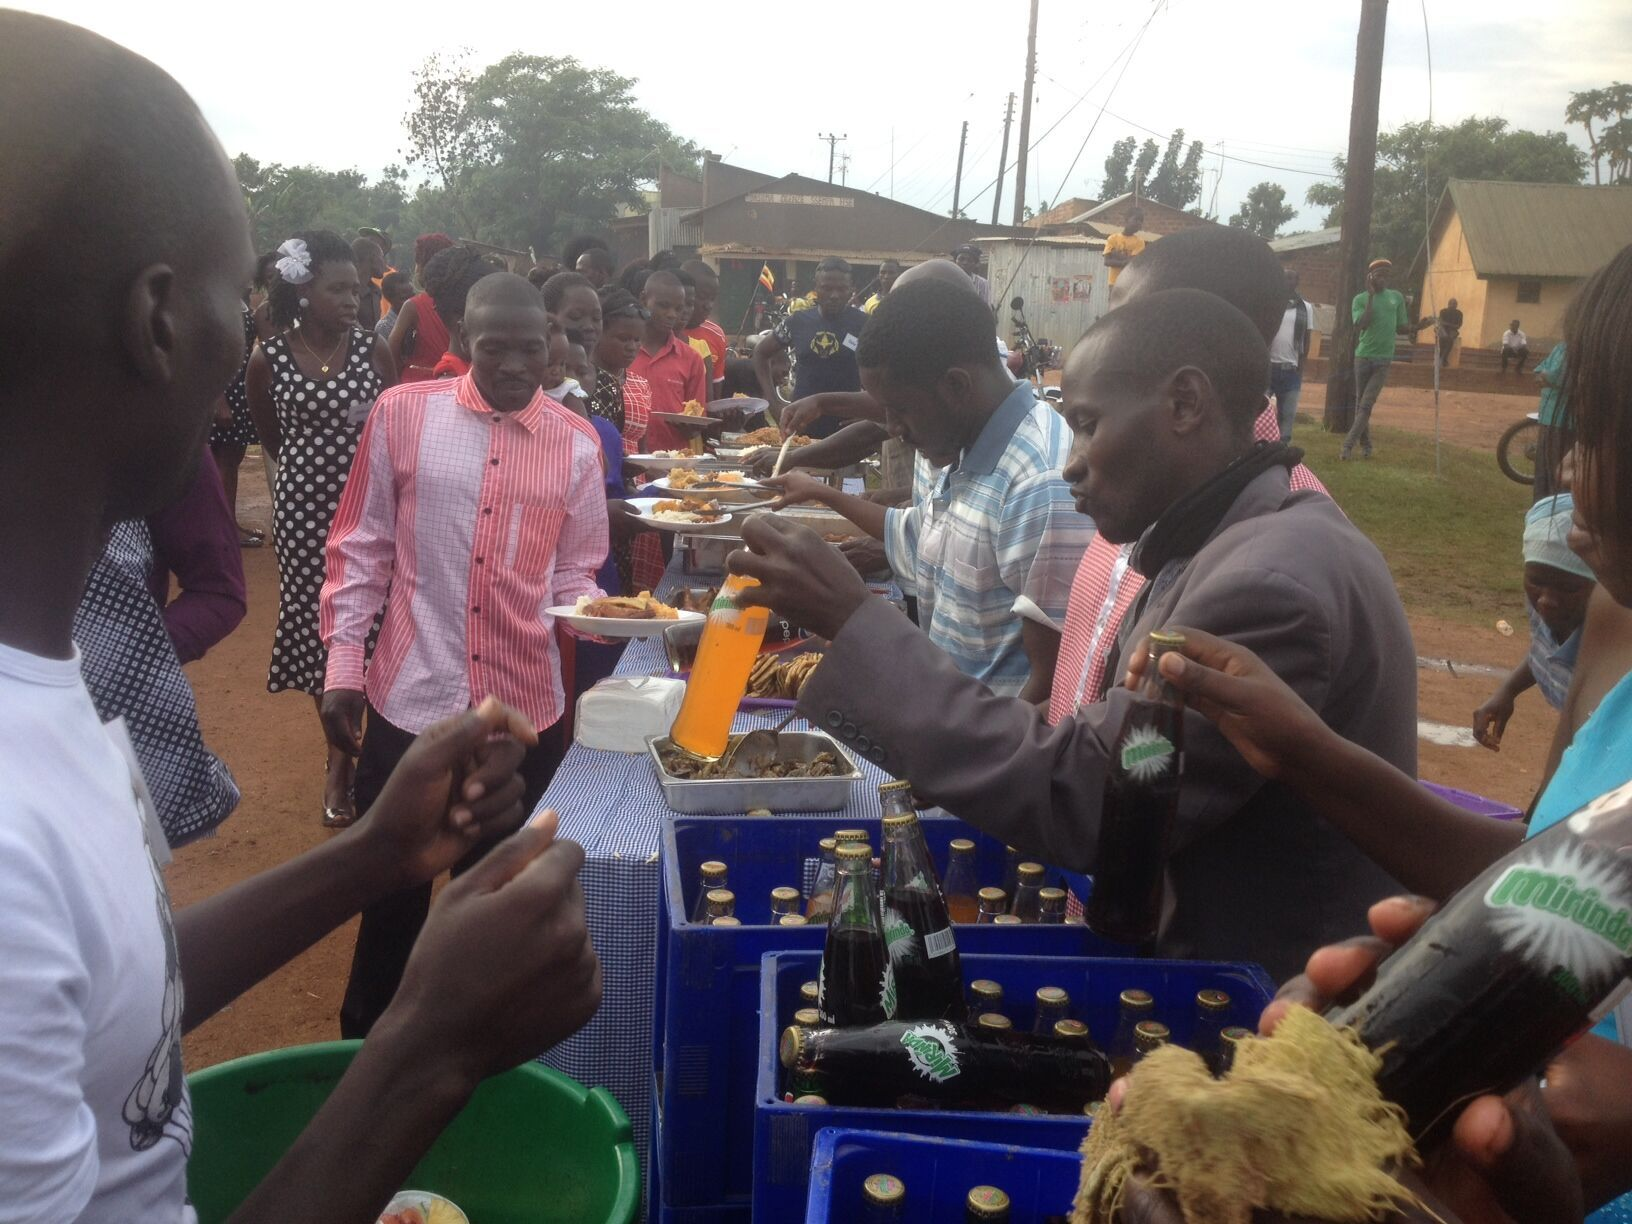 Bedrijfsfeest Uganda